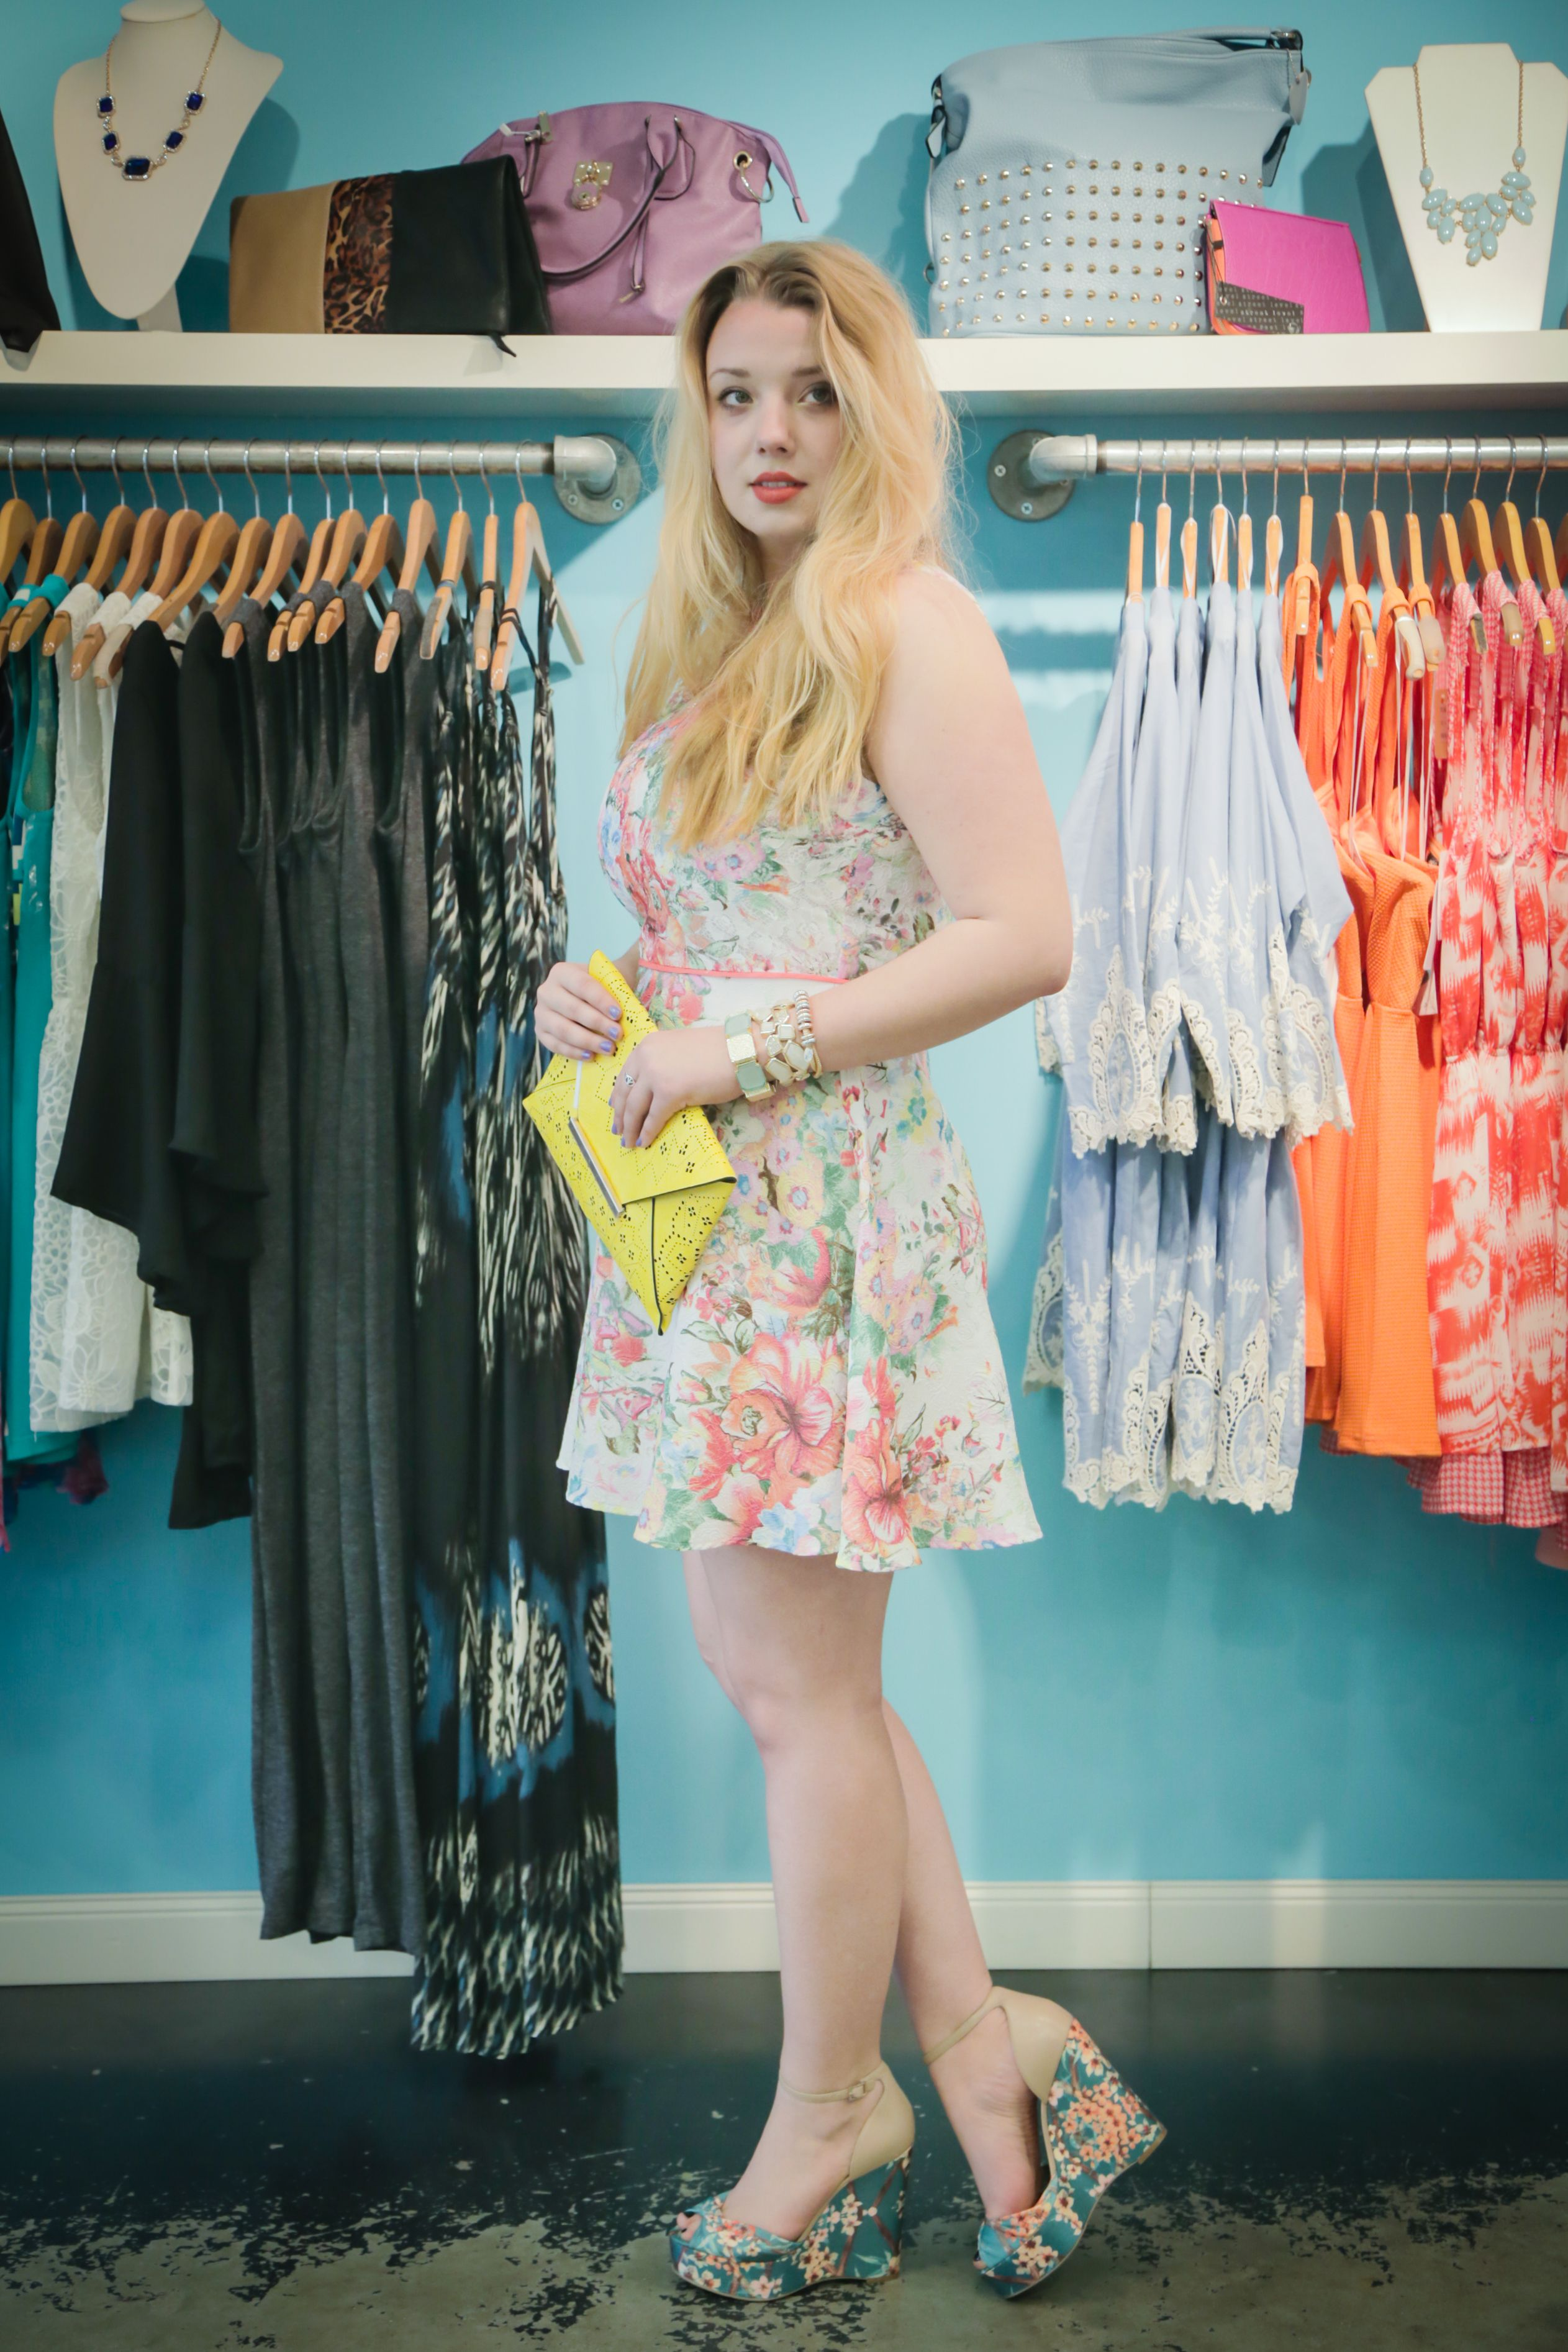 Mixing Floral Prints, Nashville Fashion, Nashville Style Blogger COSMICaroline, Local Focus Showcasing Muse Nashville, Muse Boutiques